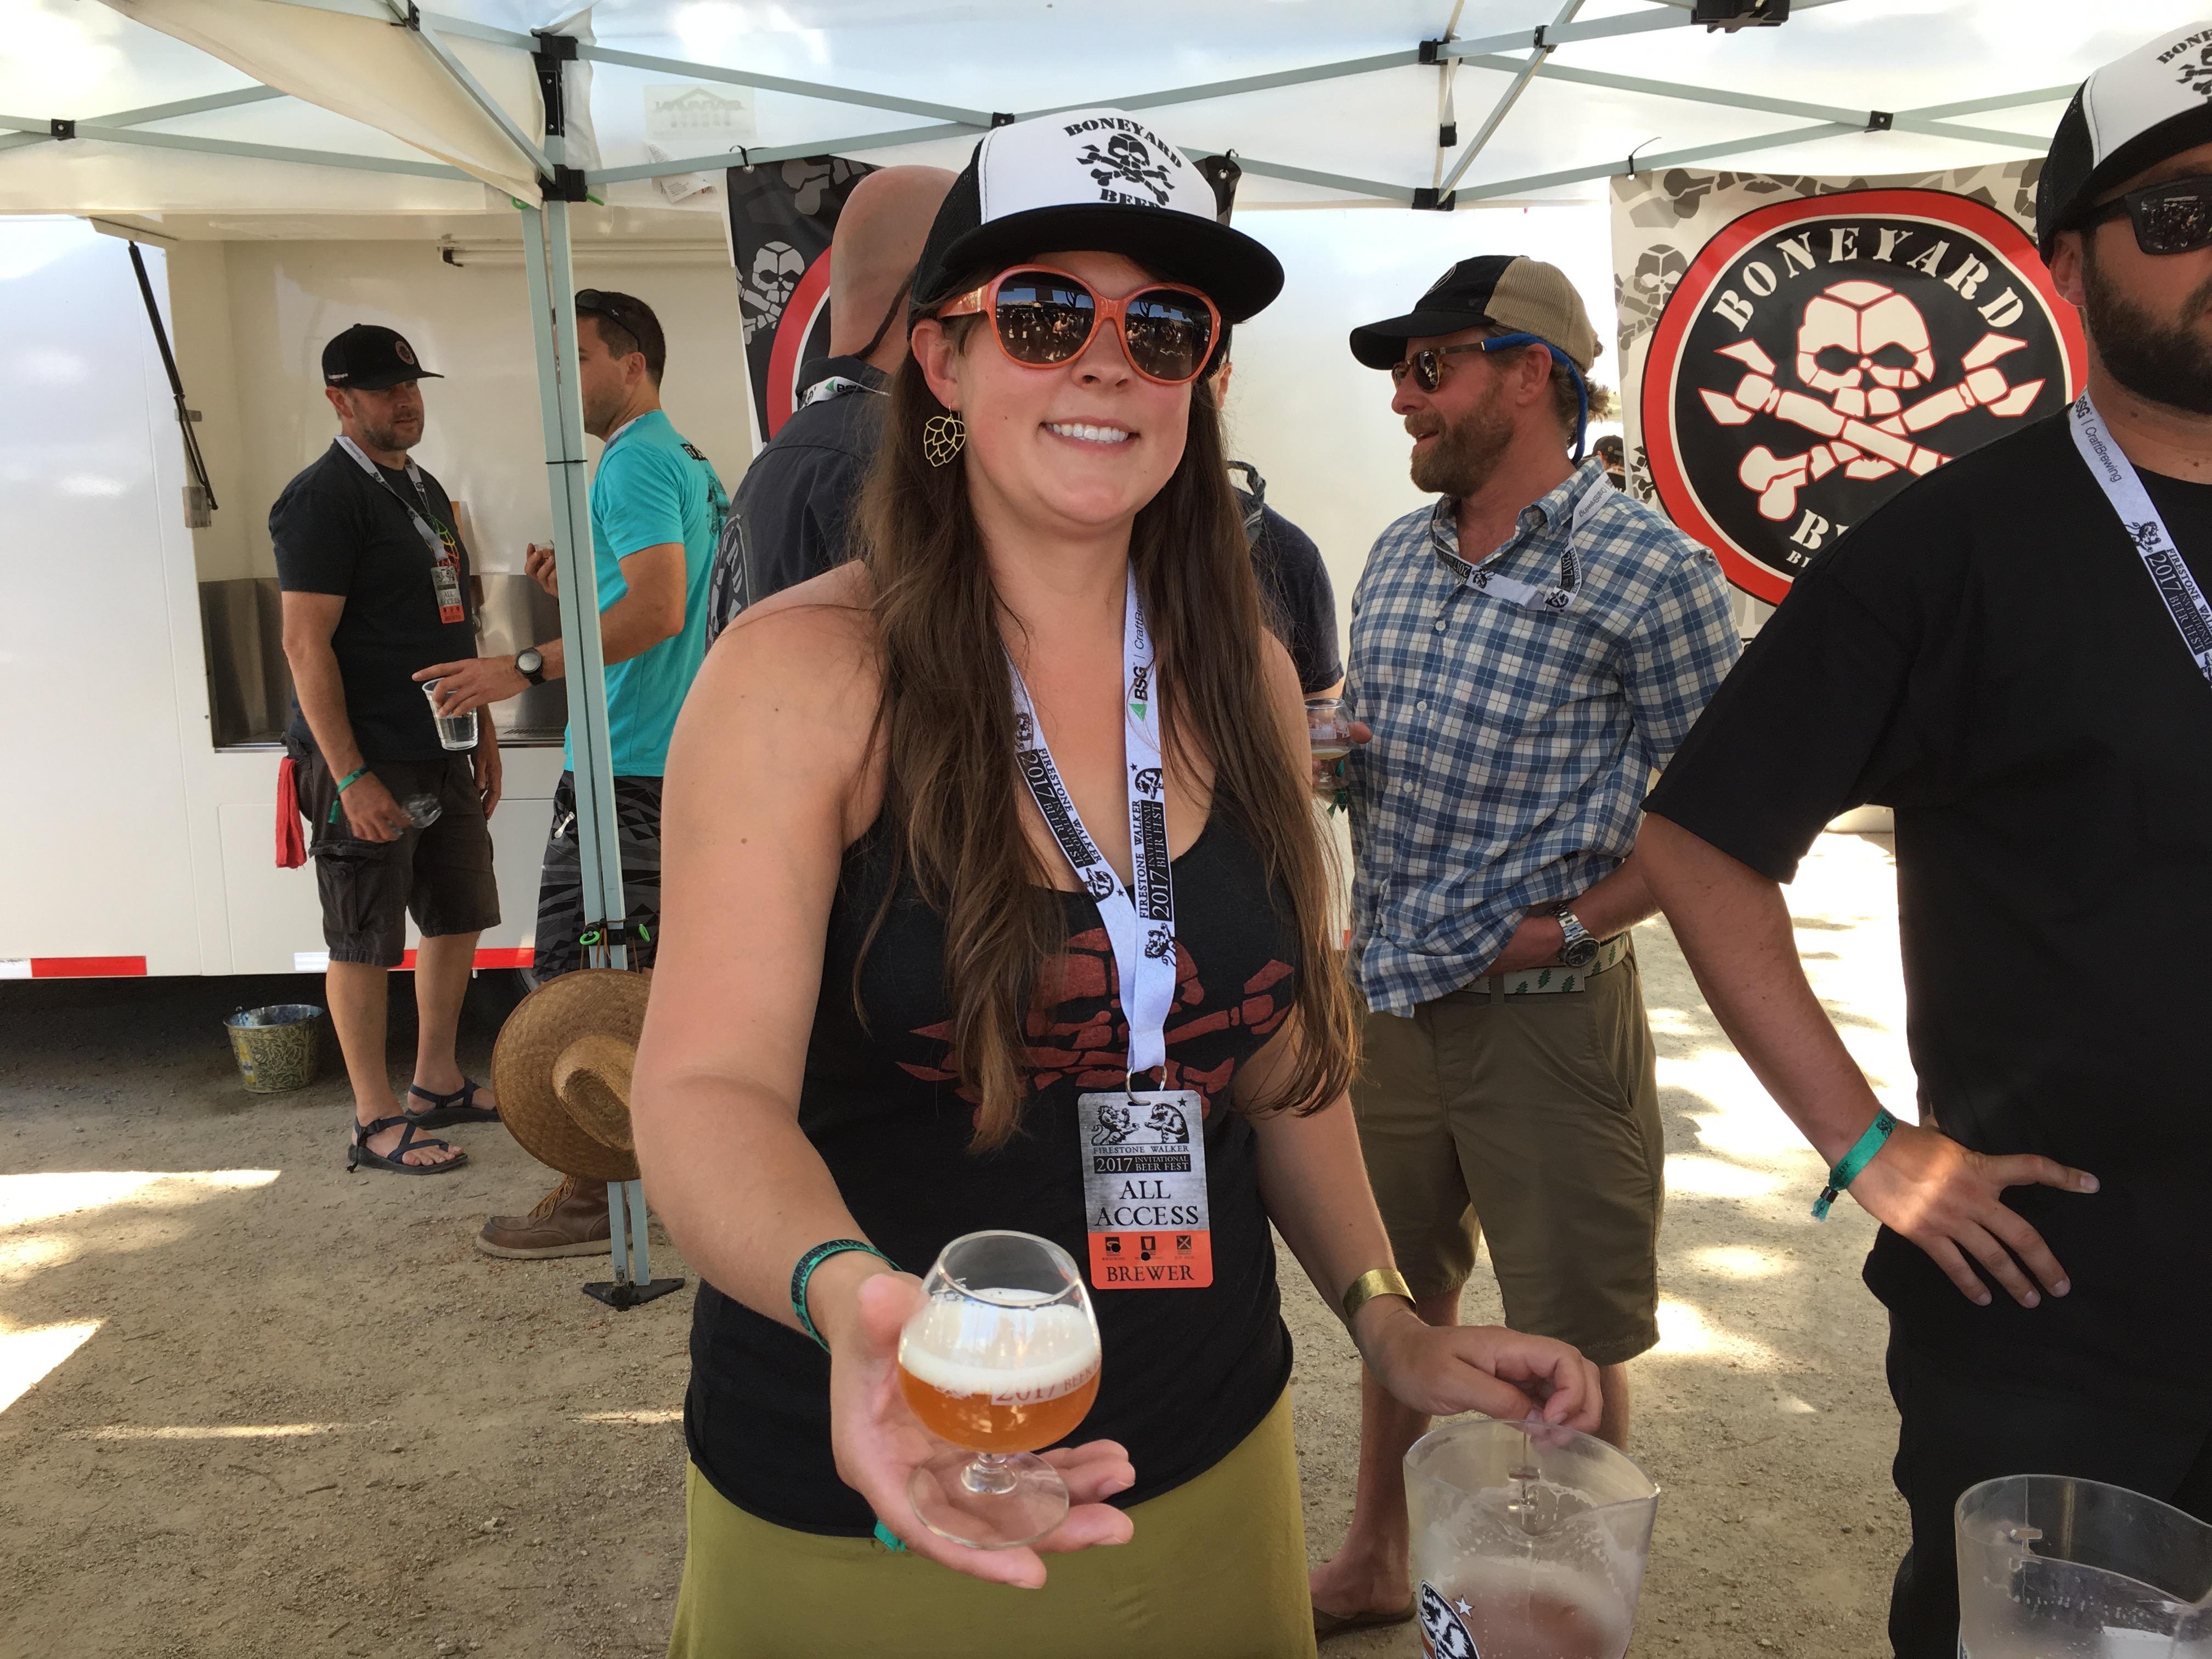 What A Weekend! Attending the 2017 Firestone Walker Invitational Beer Fest